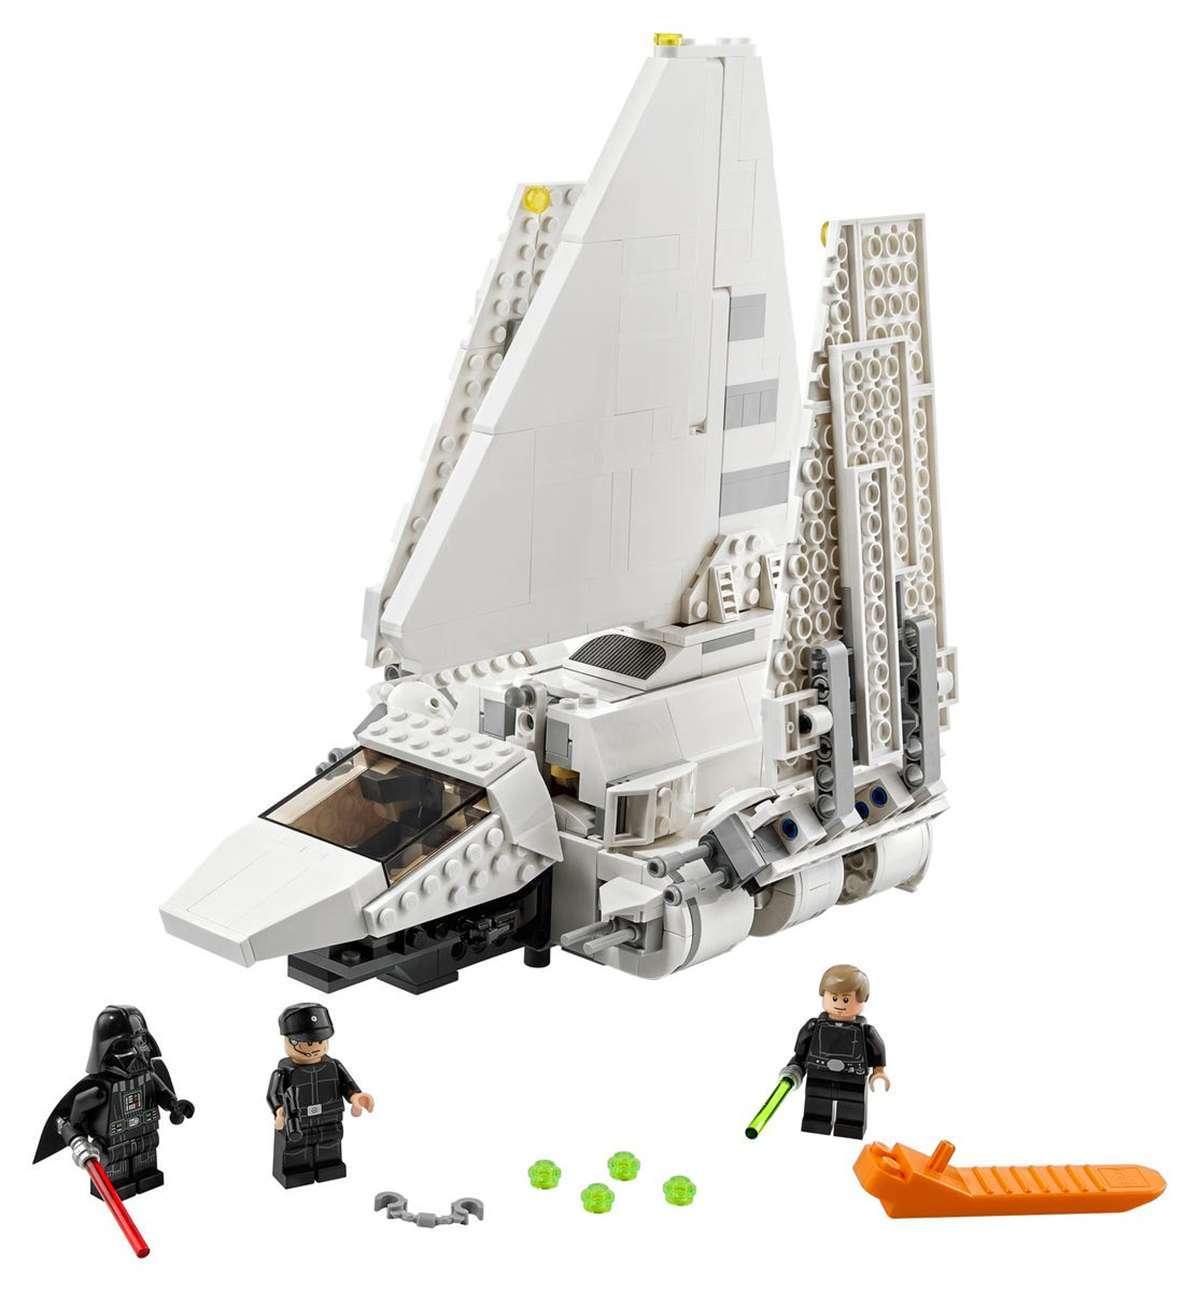 New Star Wars 2021 LEGO Sets Launch Tonight